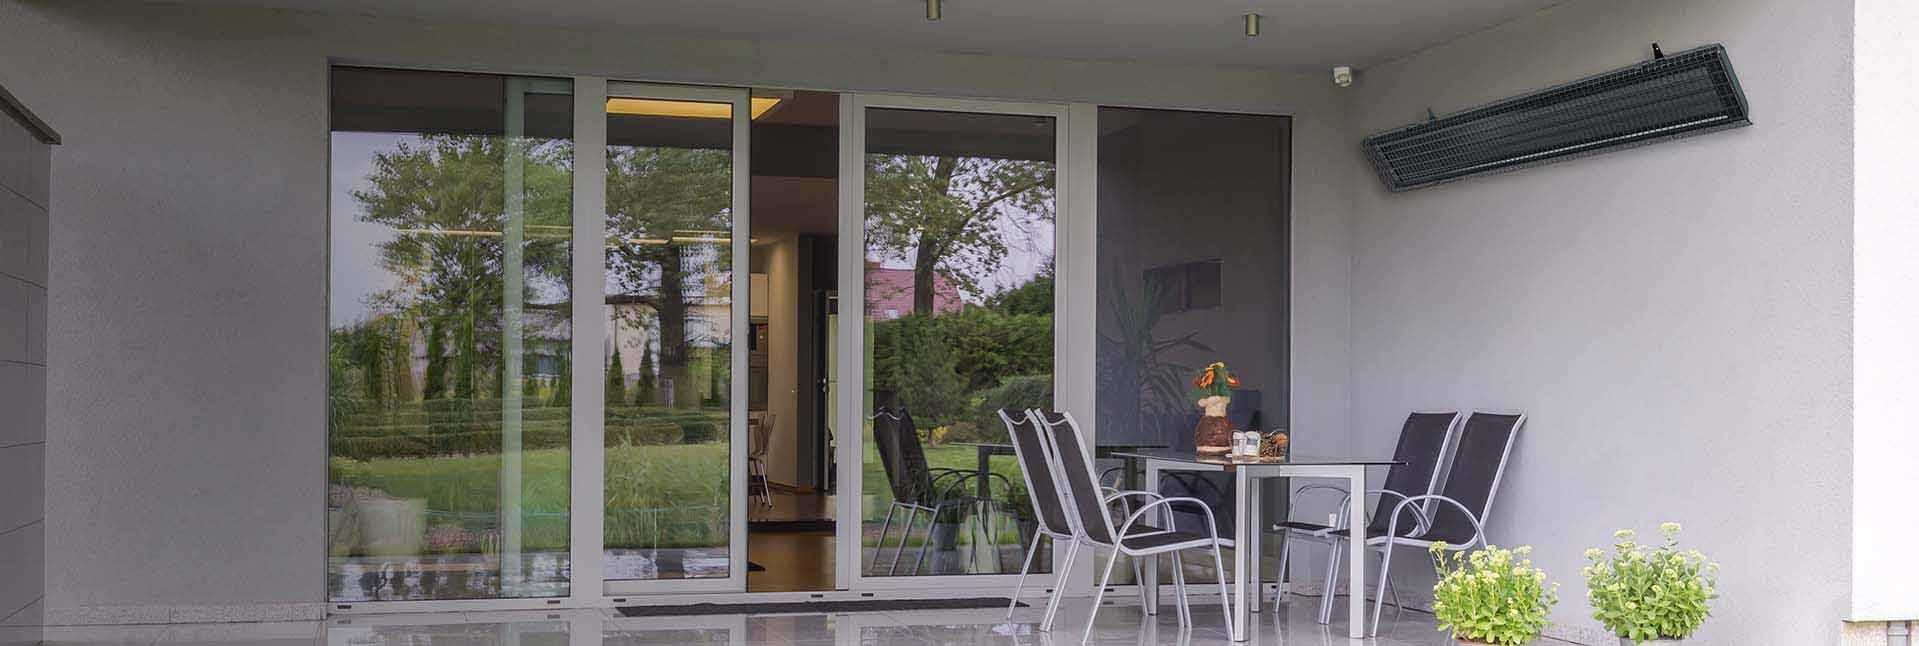 Infrarotheizung Terrassenheizung Angebot